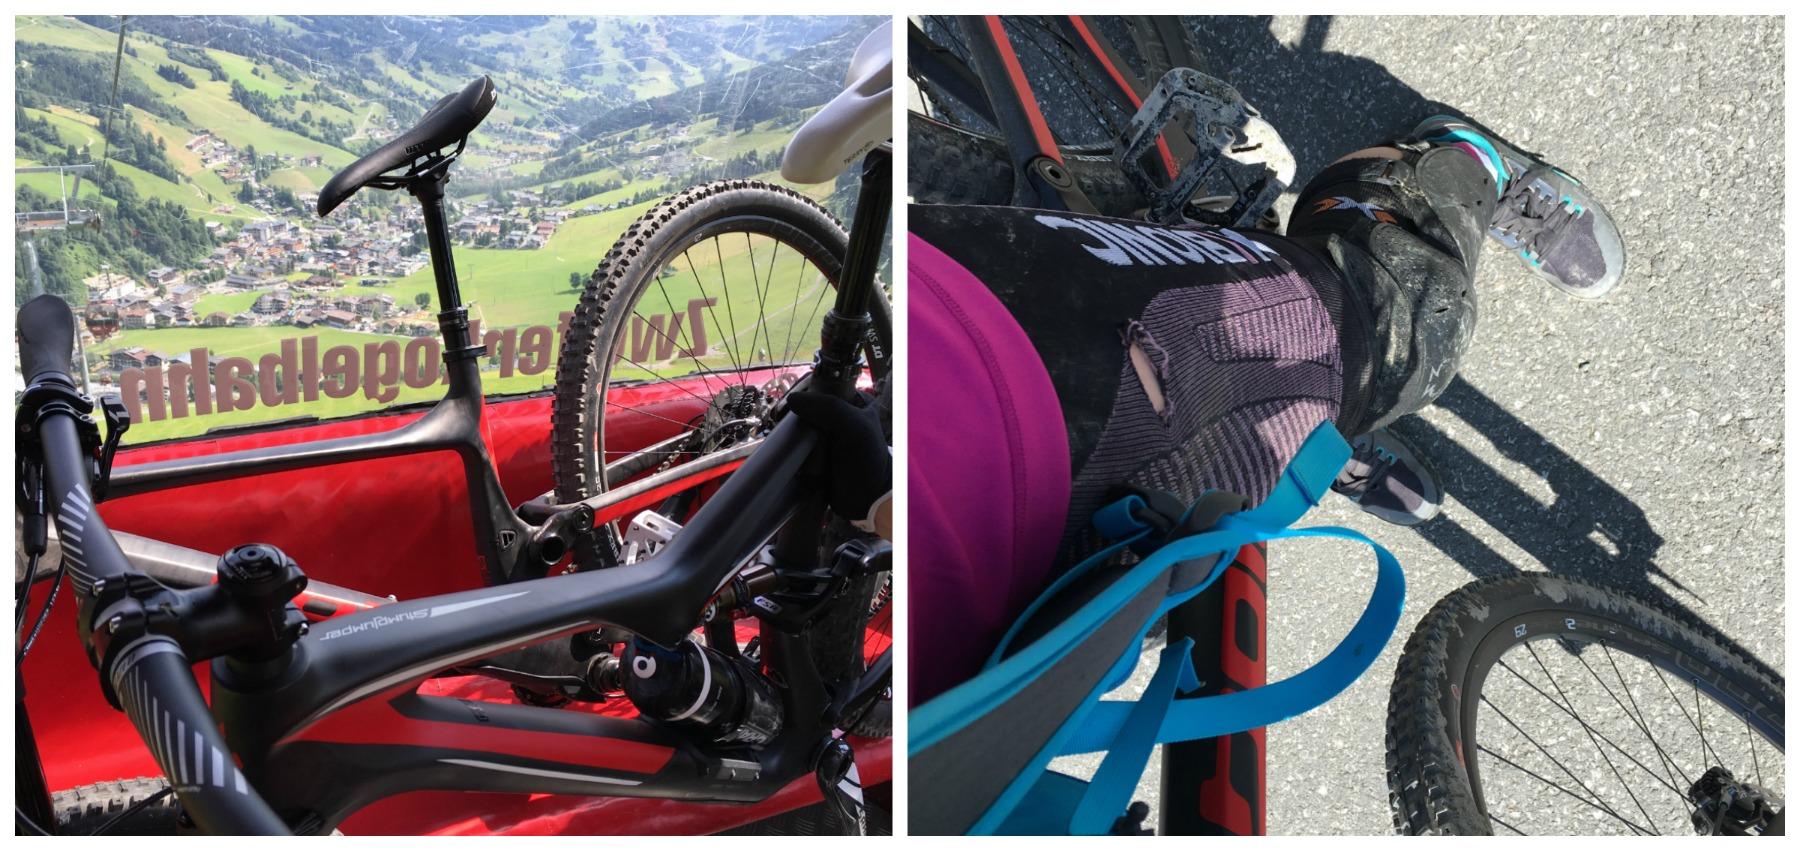 Klara-fuchs-womens-bike-camp-saalbach-frauen-fitness-fitnessblog-downhill-bike-l